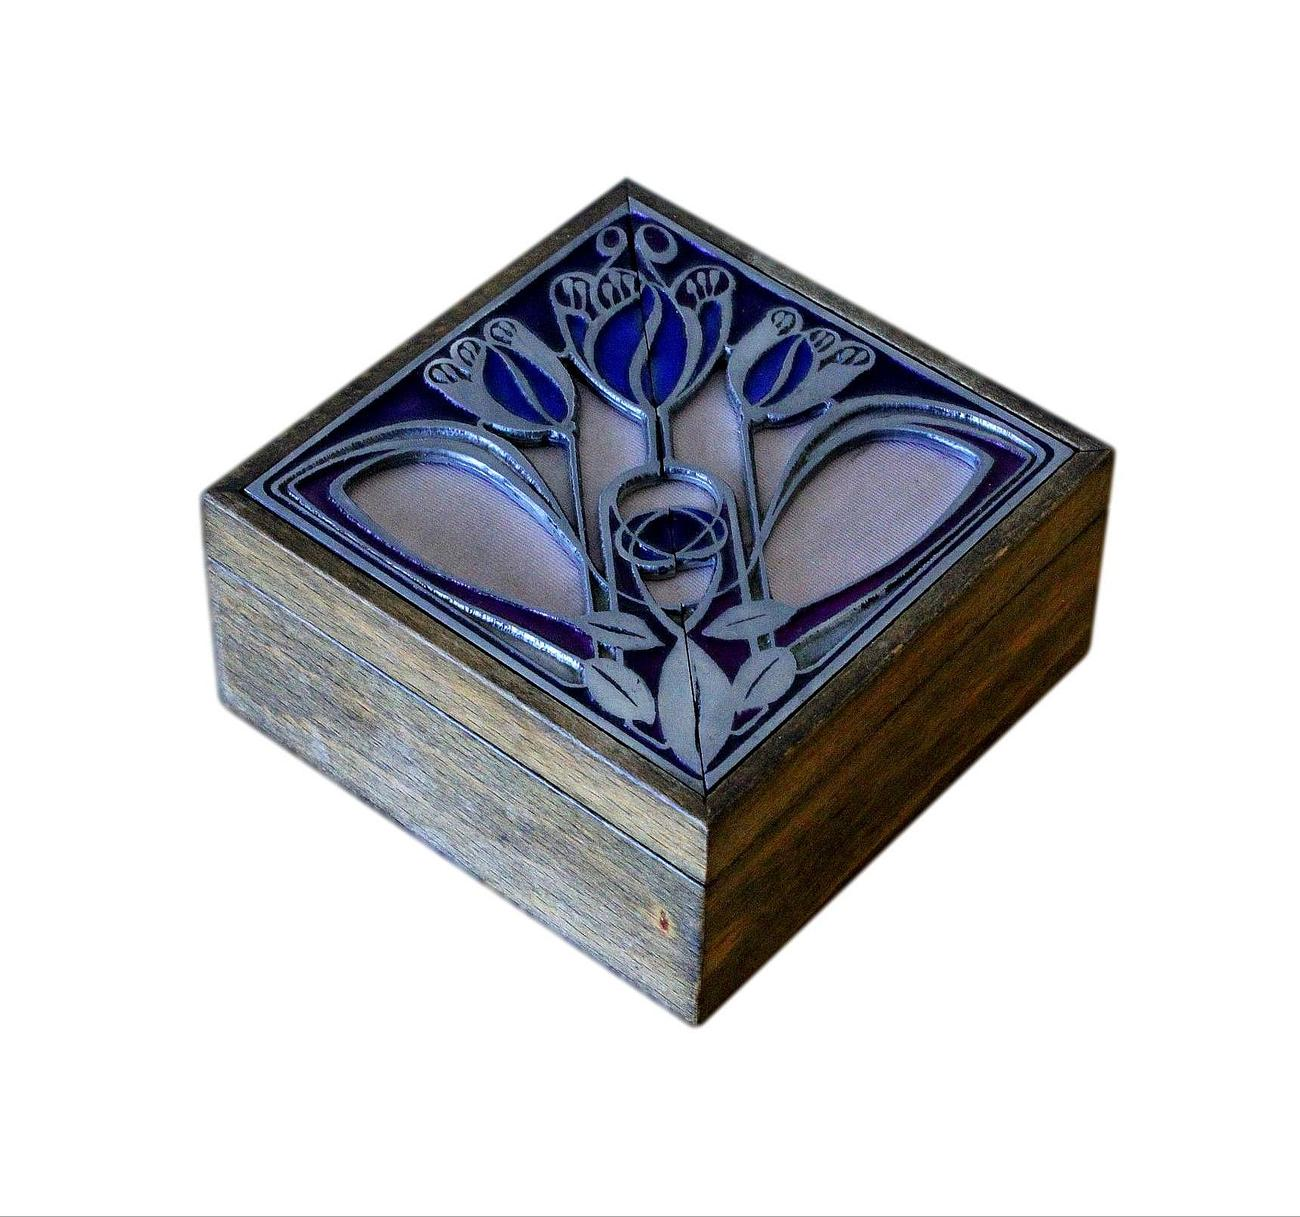 Art_Nouveau_Enameled_Jewellery_Box_4.jpg